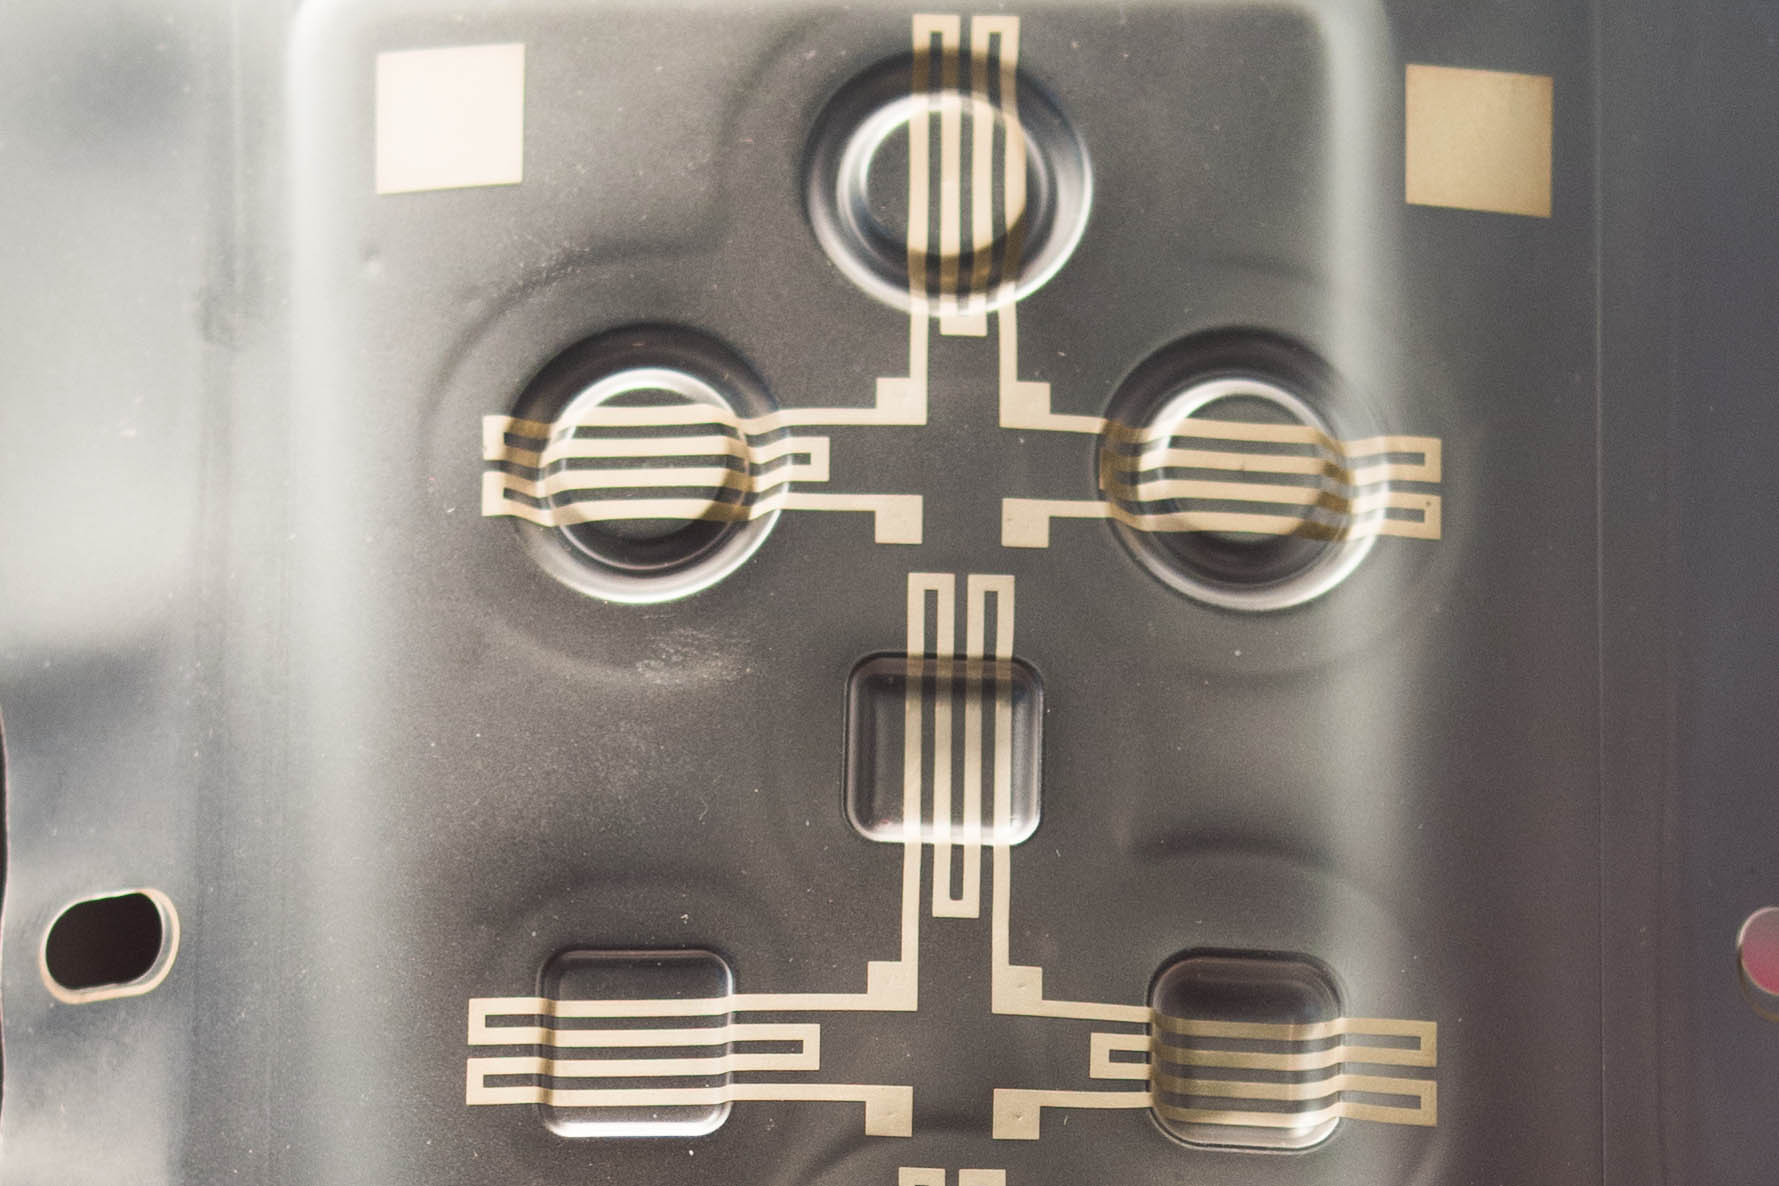 DuPont printed electronics